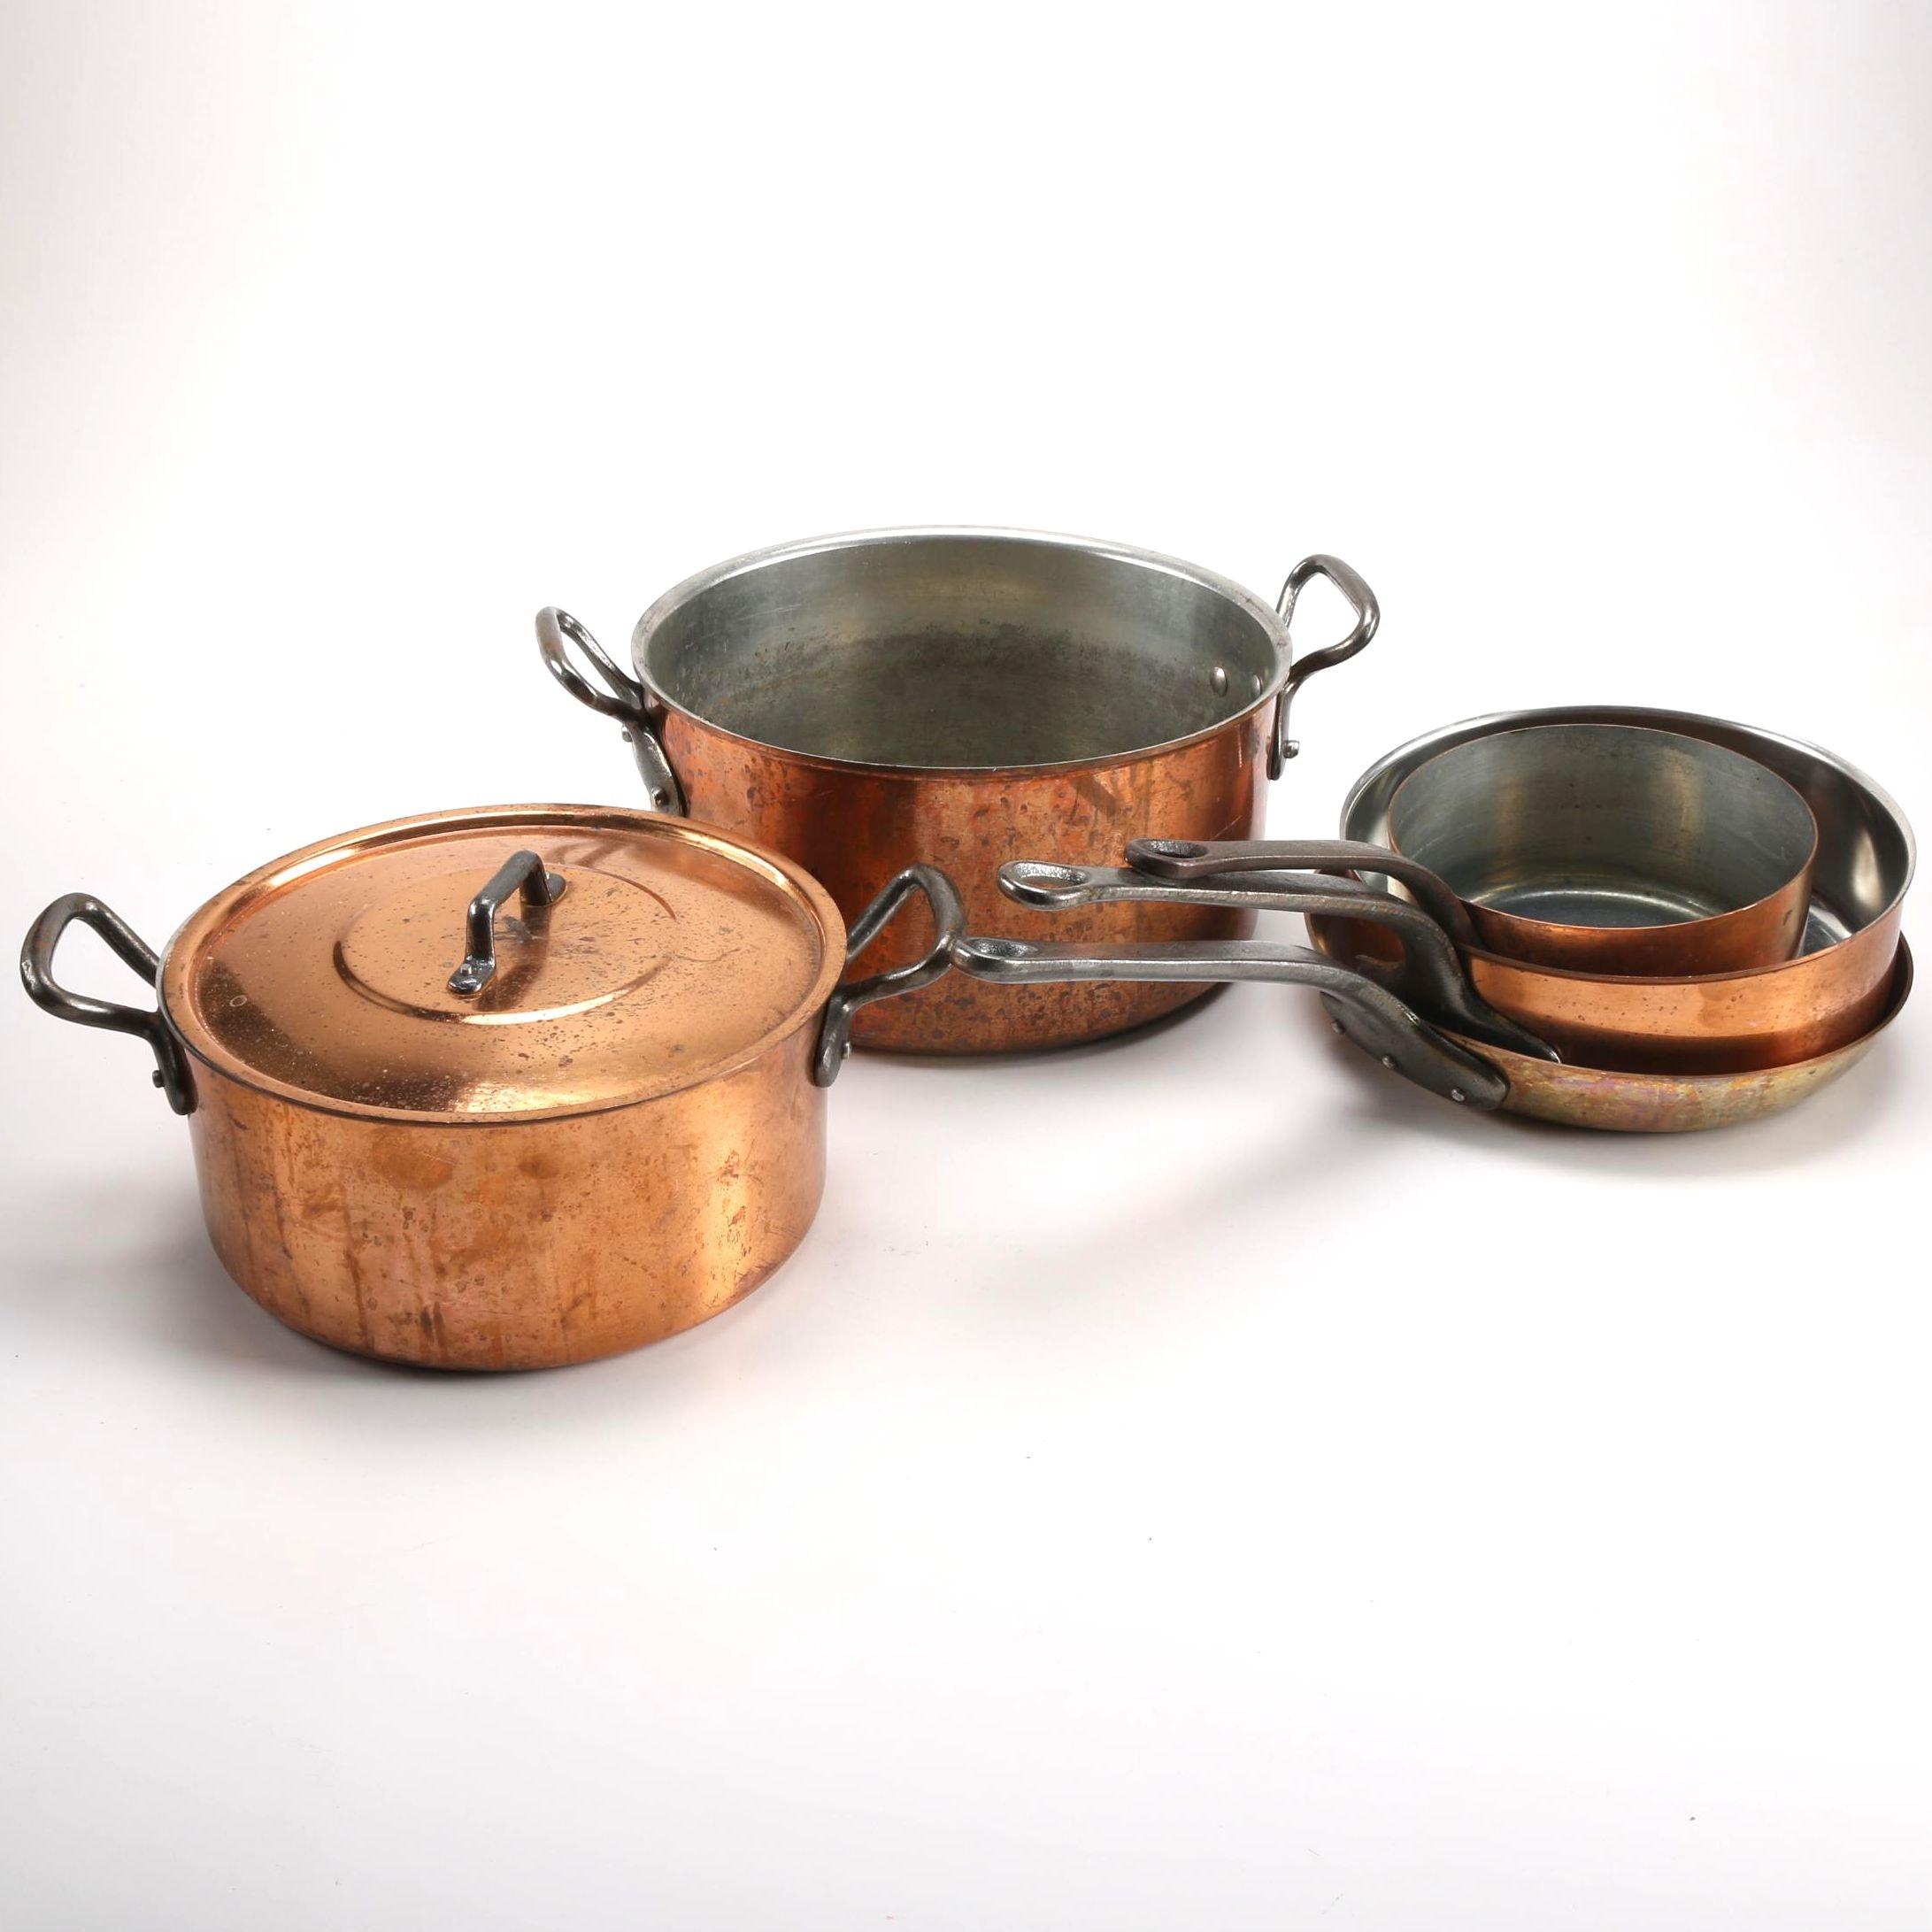 Copper Finish Cookware